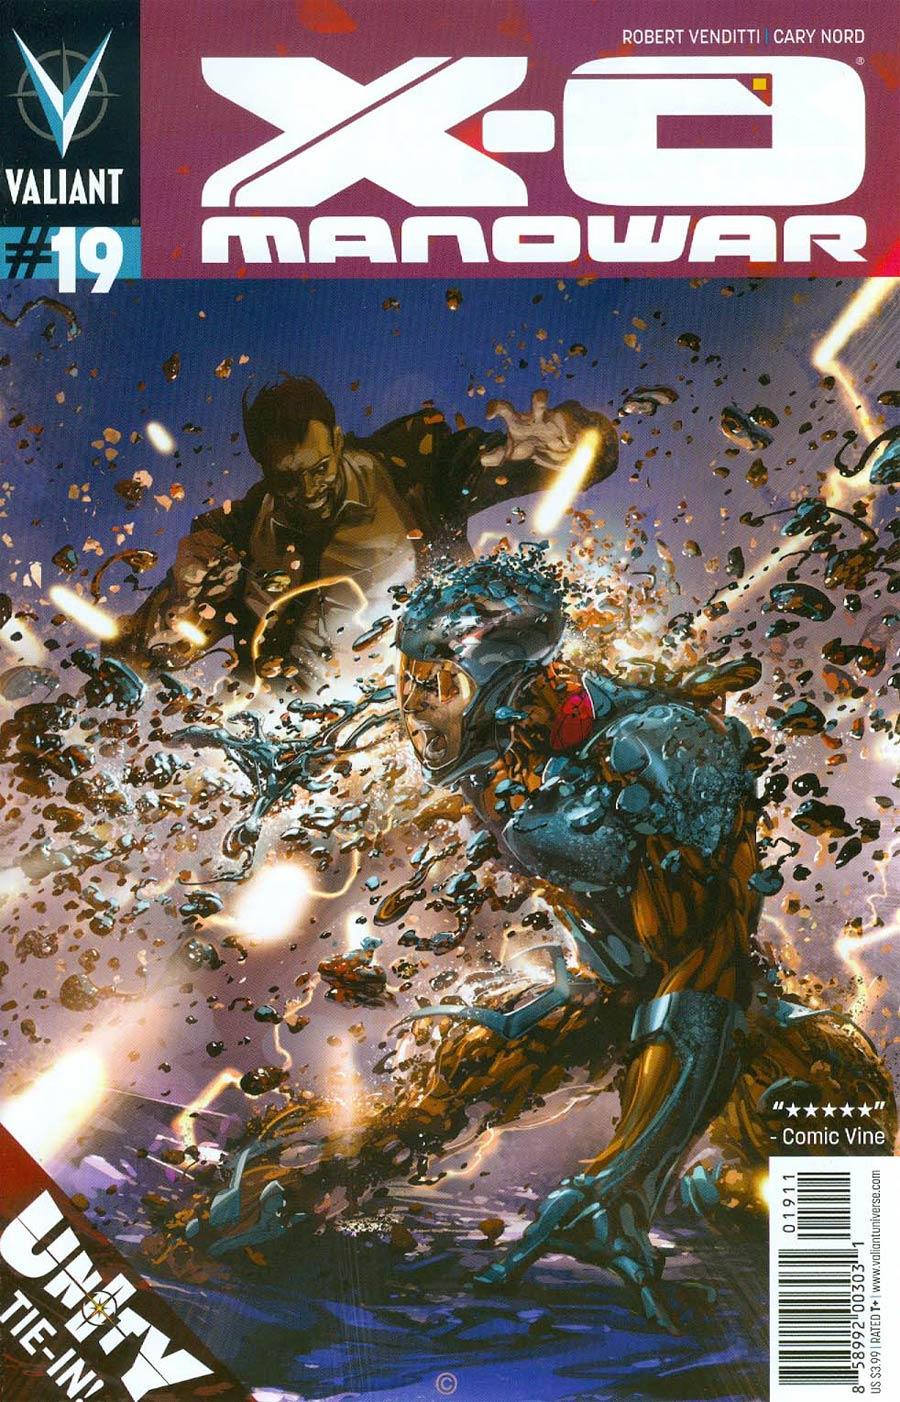 X-O Manowar Vol 3 #19 Cover A Regular Clayton Crain Cover (Unity Tie-In)